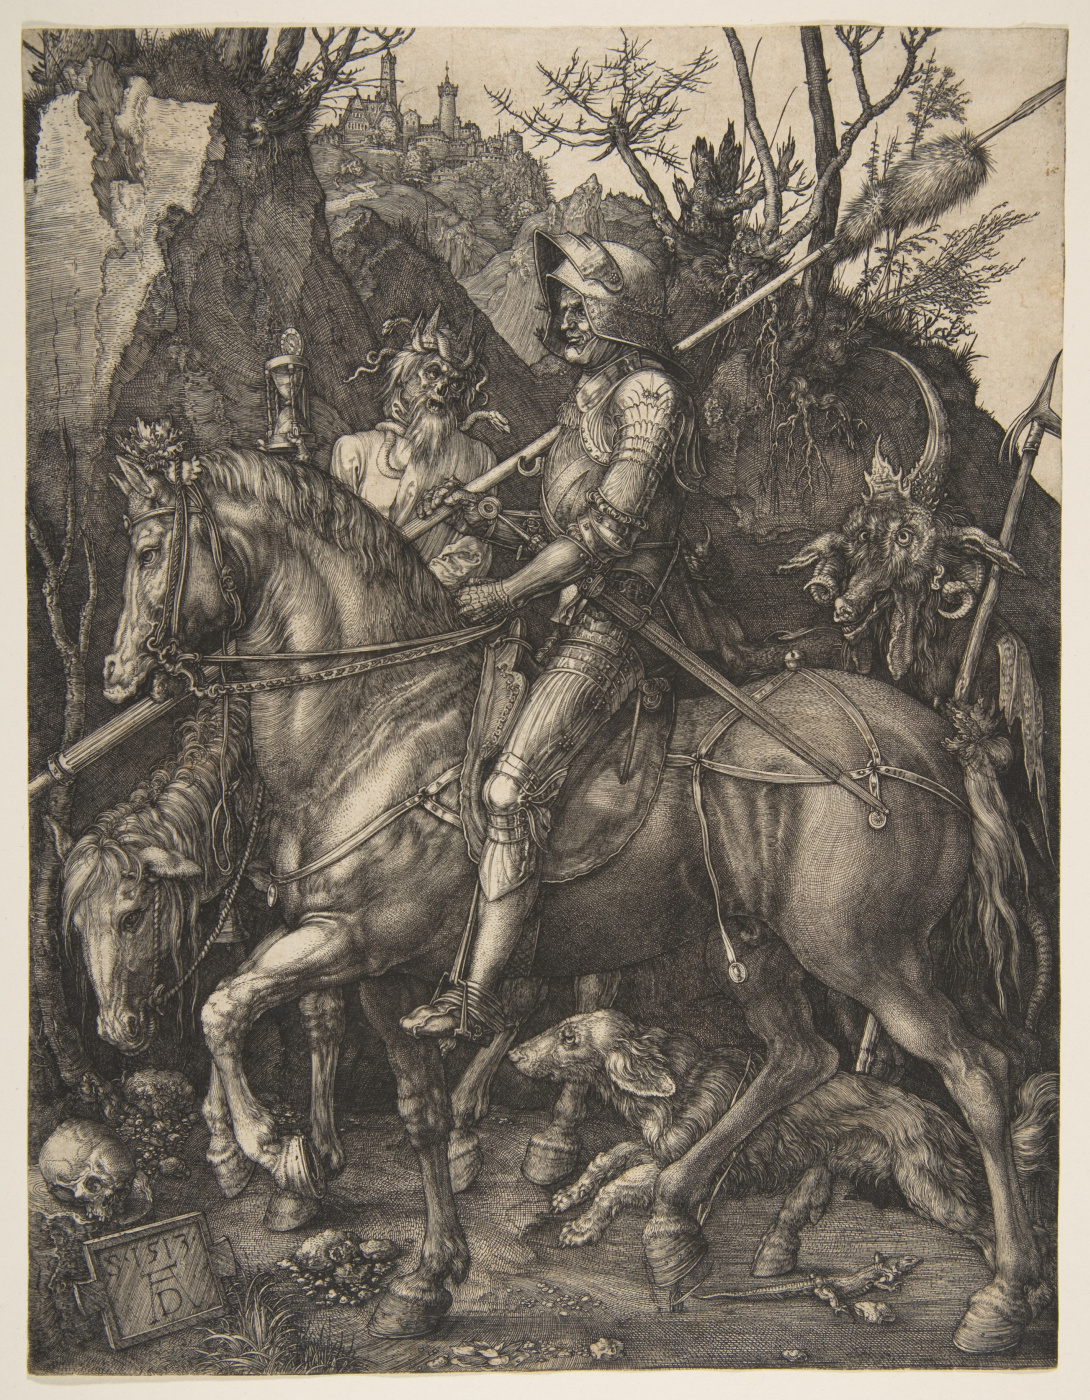 Albrecht Dürer. The knight, Death and the Devil